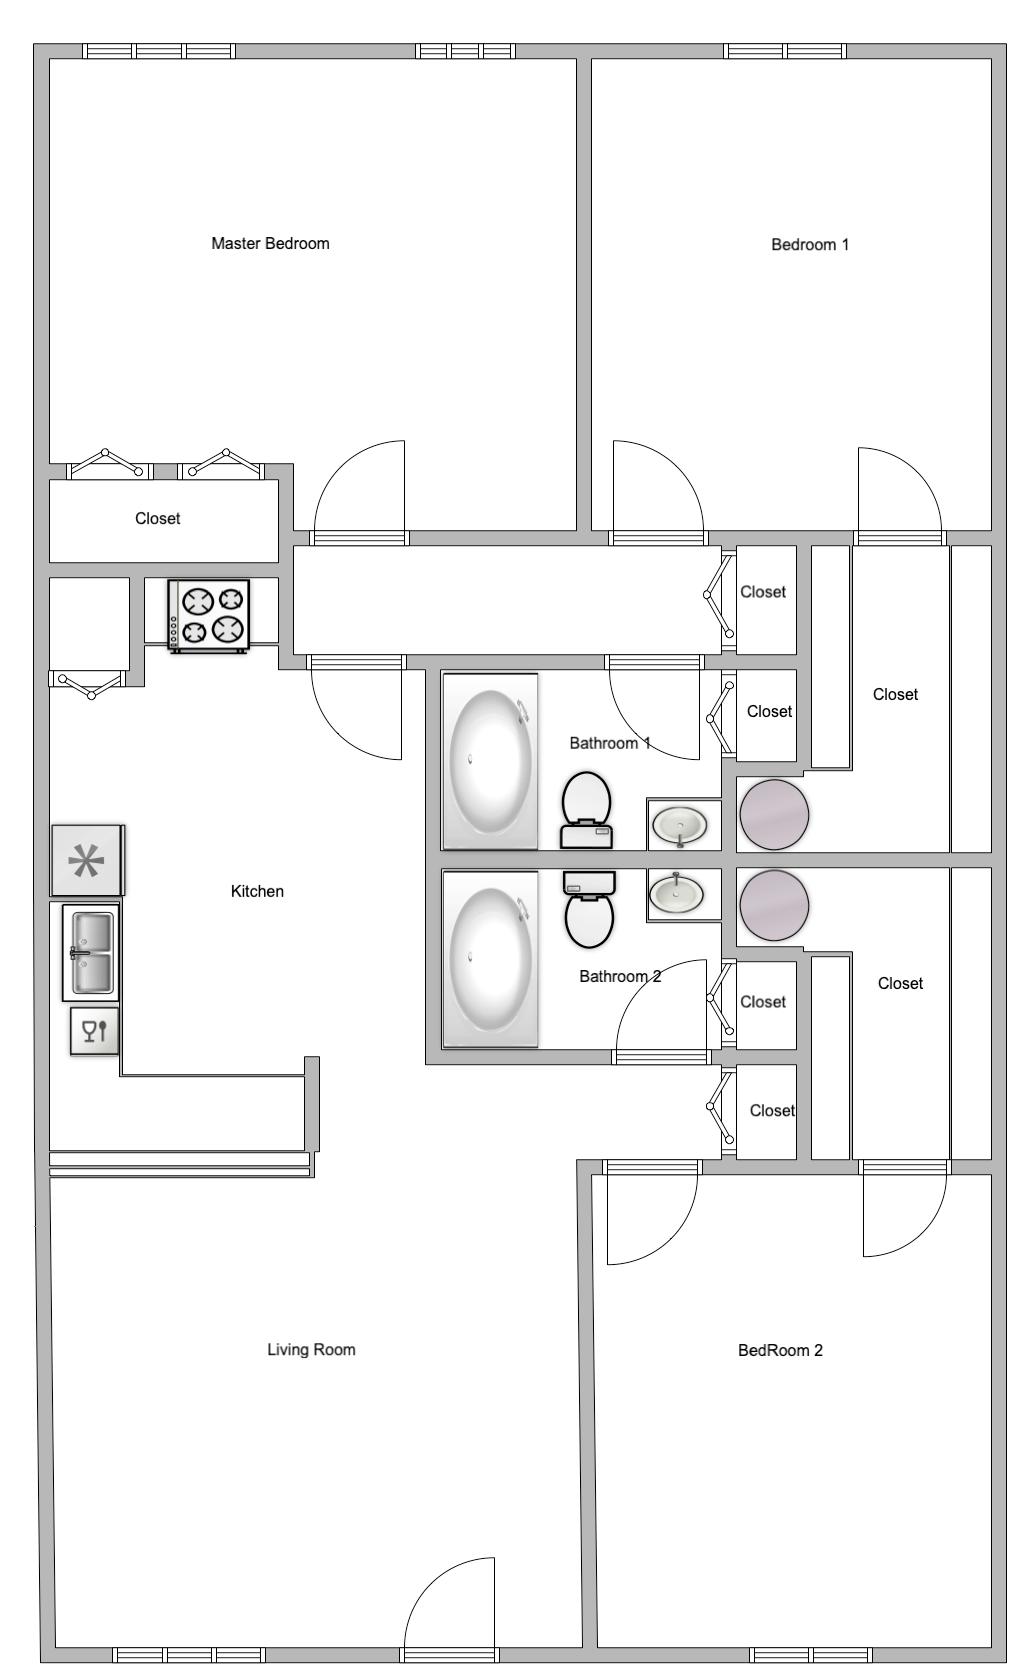 Floorplan - PC2 image